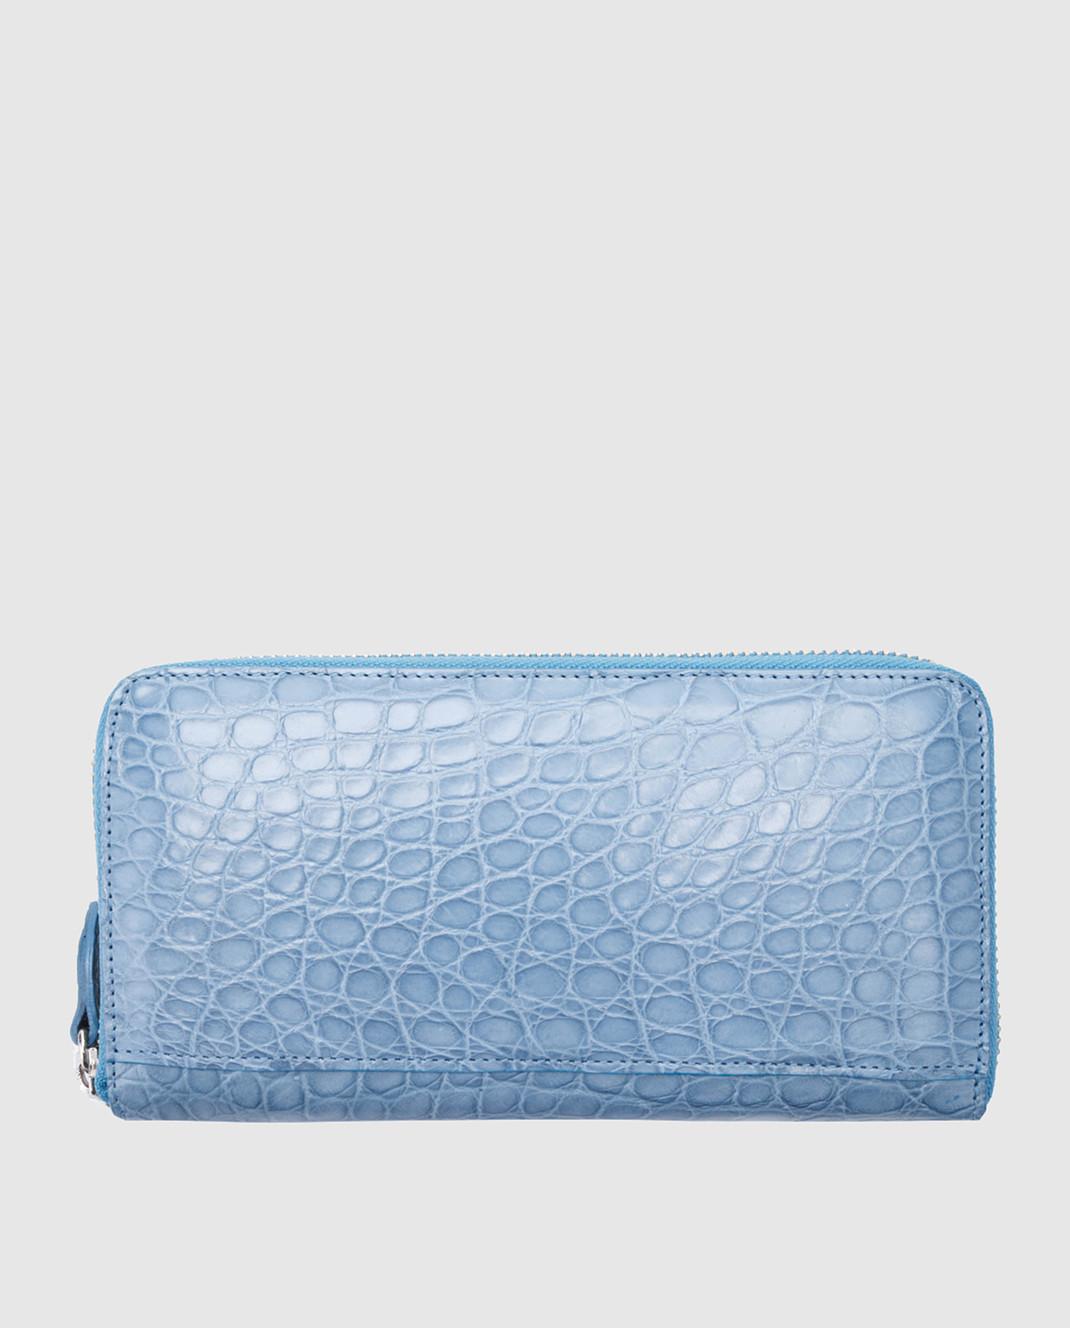 Bochicchio Голубой кожаный кошелек изображение 2